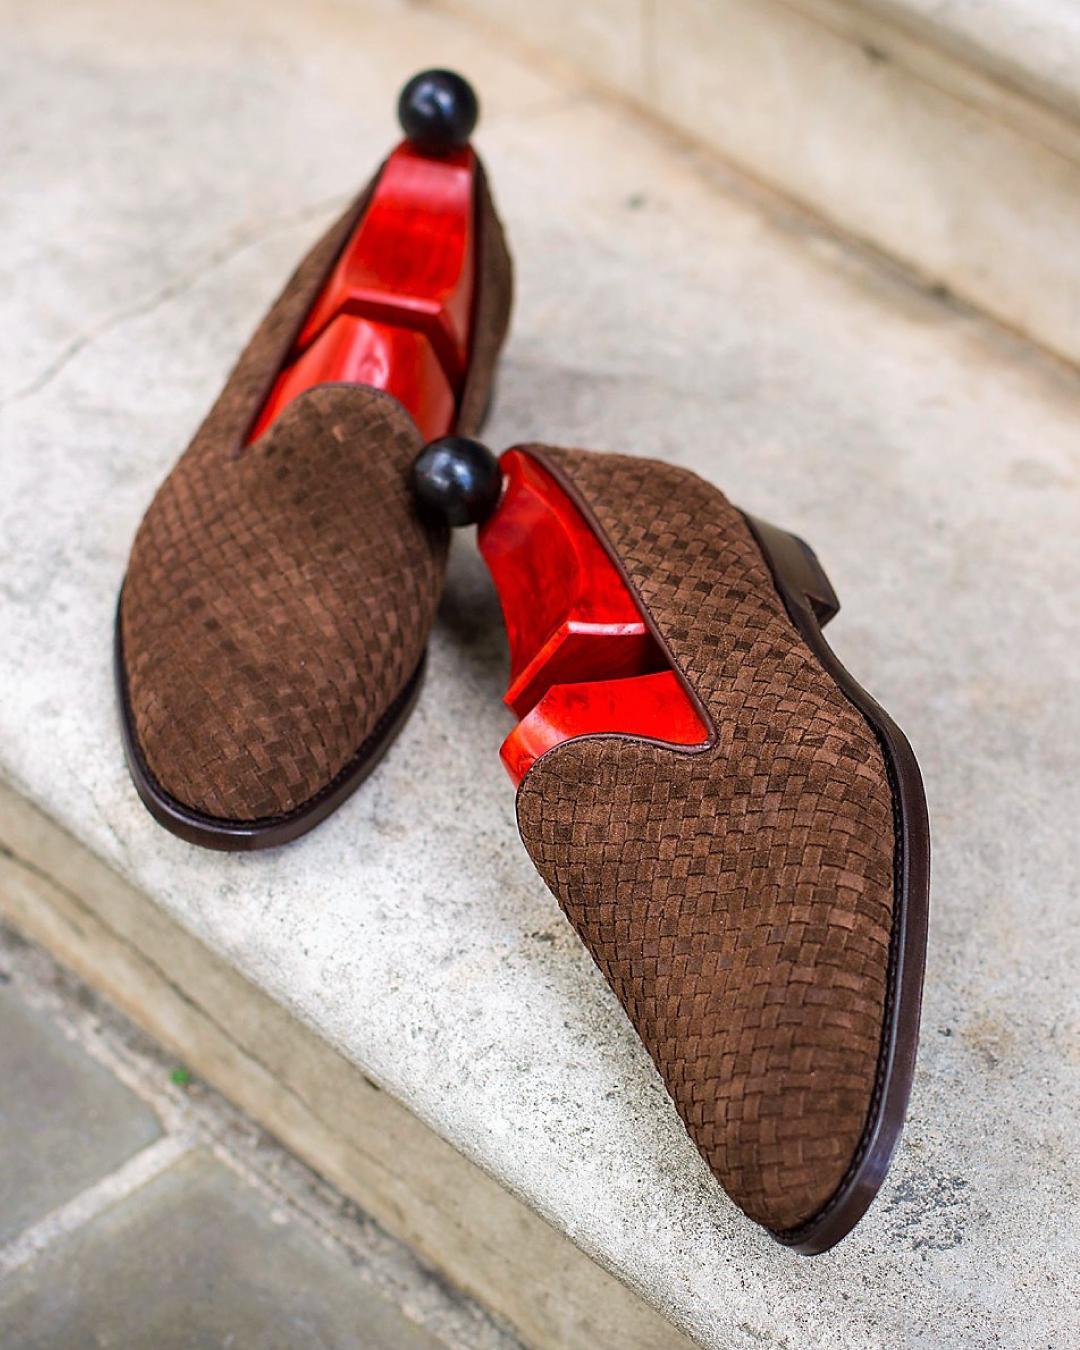 j-fitzpatrick-footwear-banner-loafer-instagram-2-2019.jpg